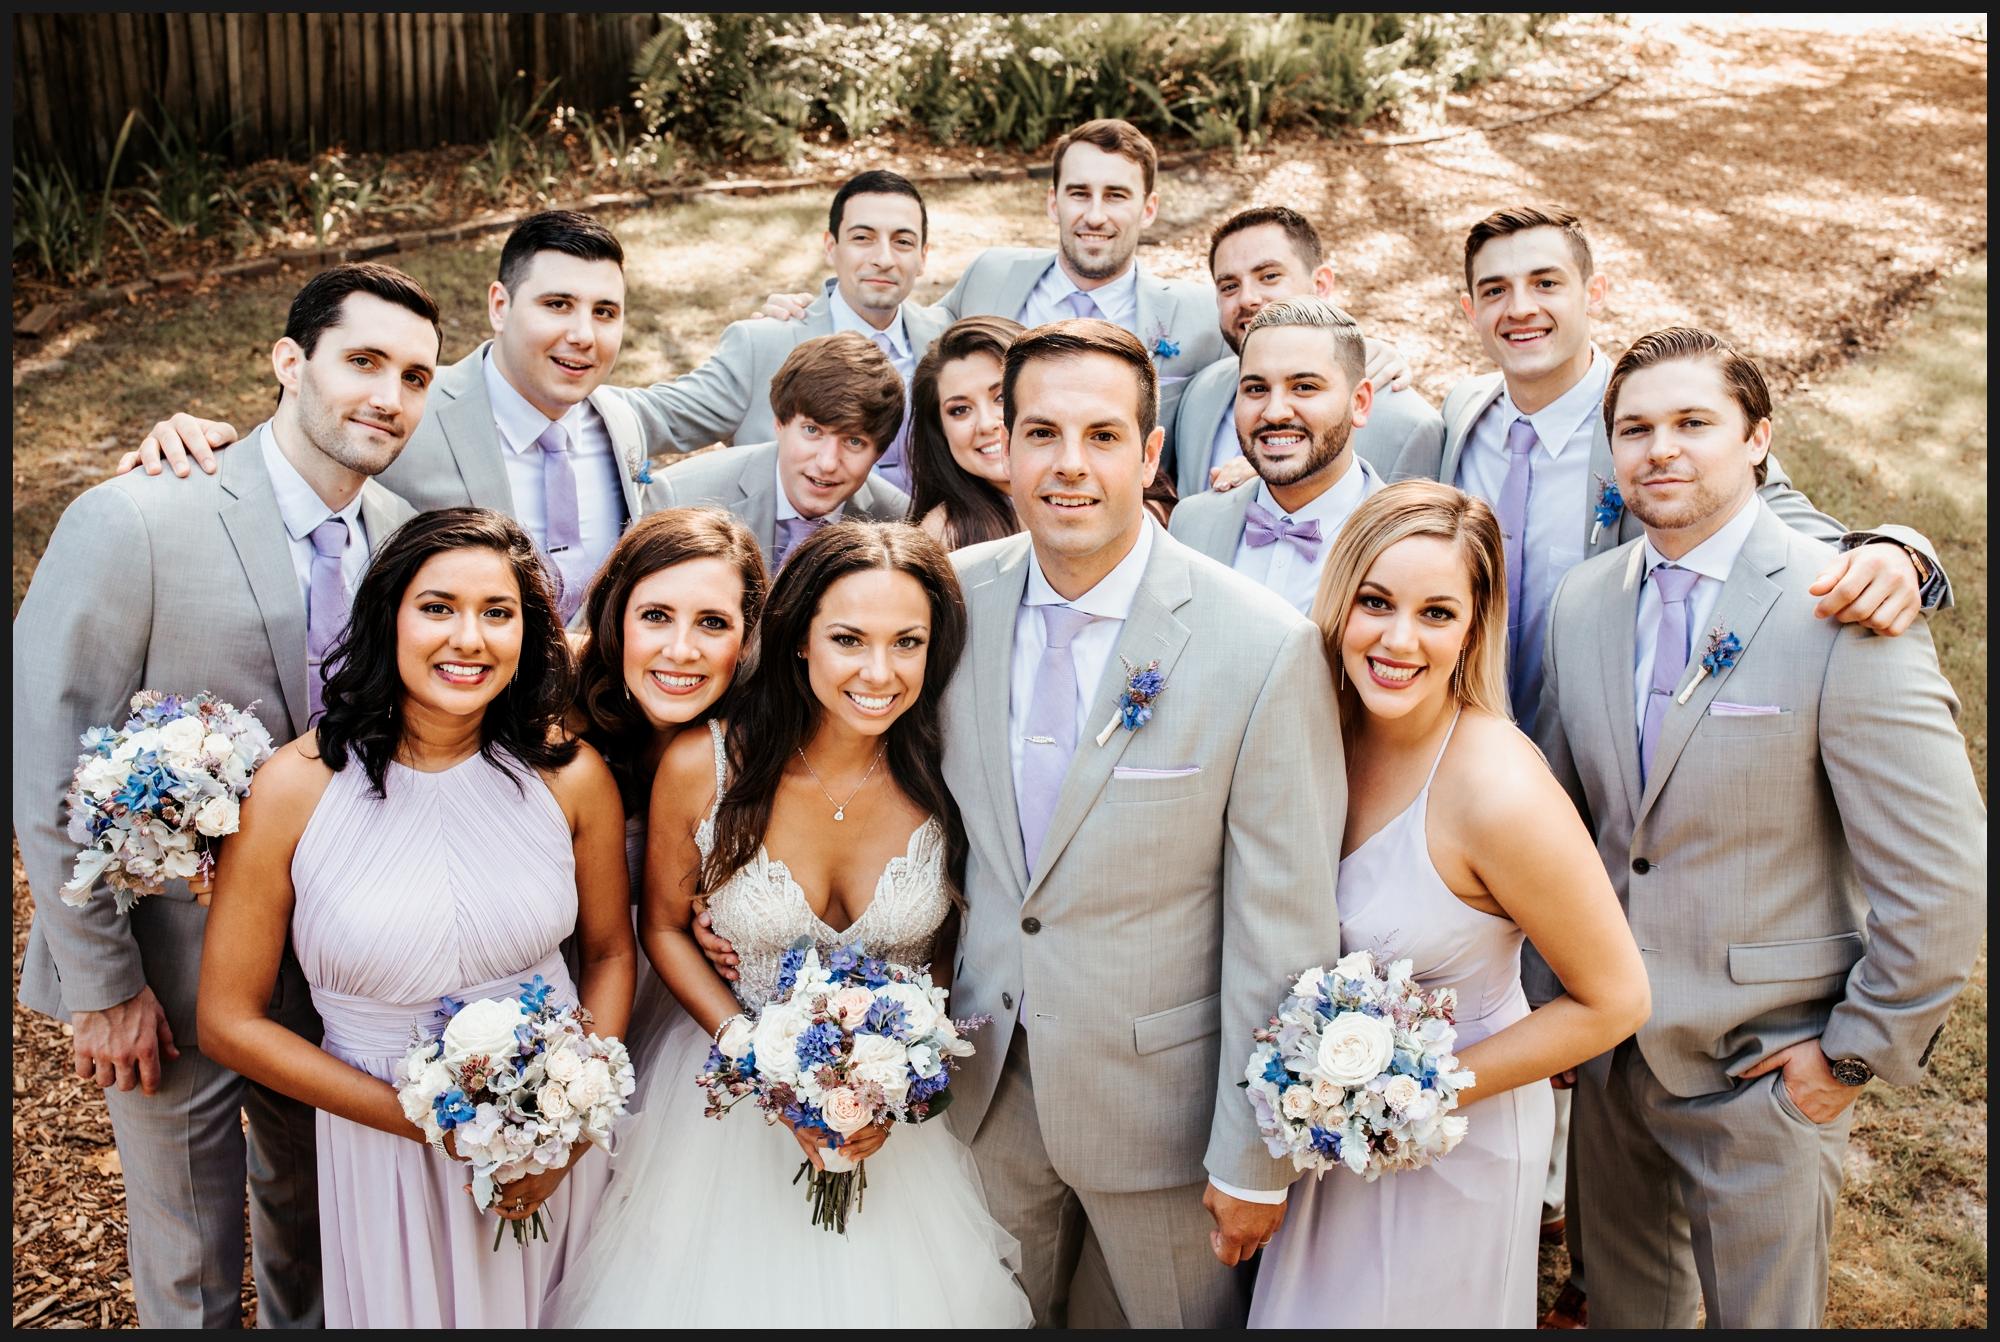 Orlando-Wedding-Photographer-destination-wedding-photographer-florida-wedding-photographer-bohemian-wedding-photographer_1622.jpg